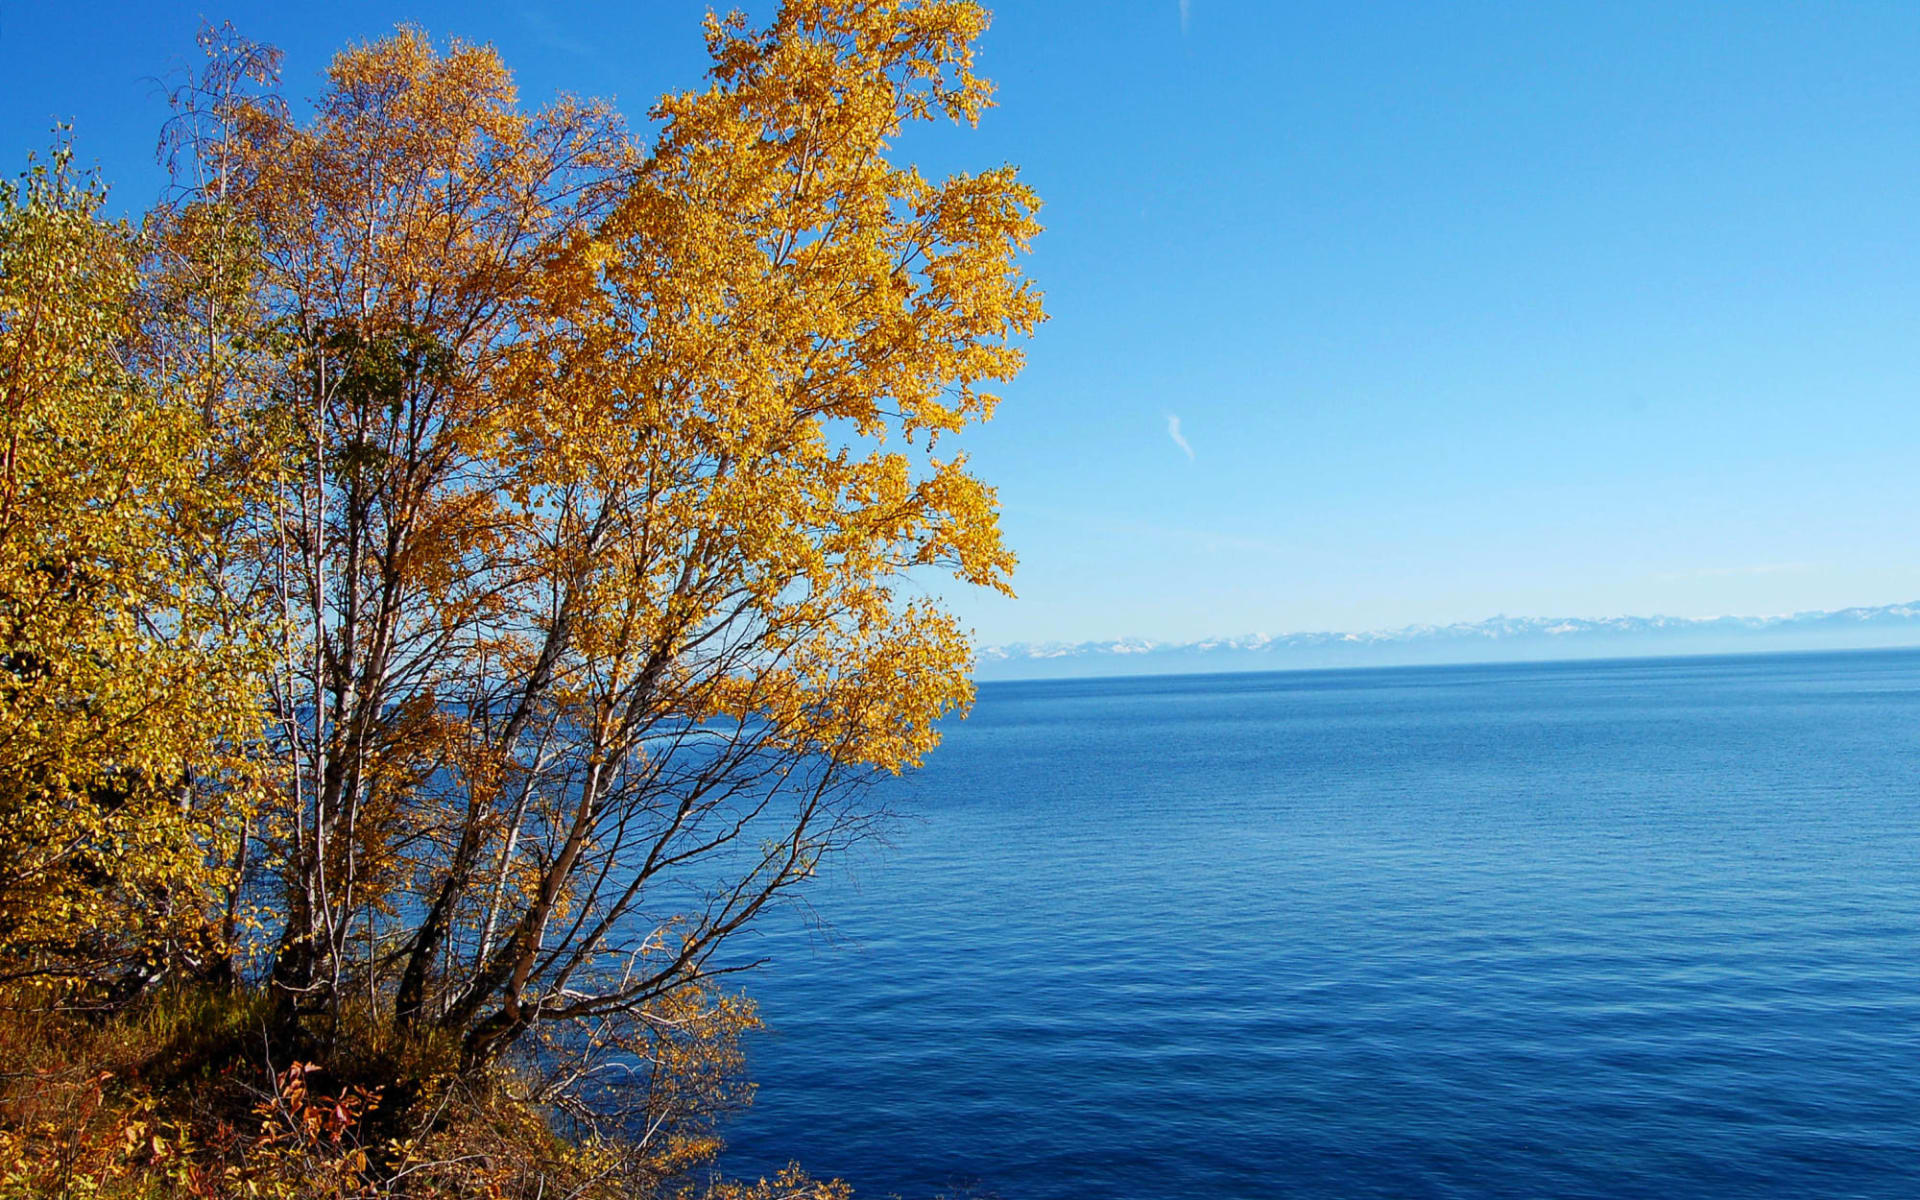 Irkutsk und der Baikalsee: Russland - Baikalsee - Herbst